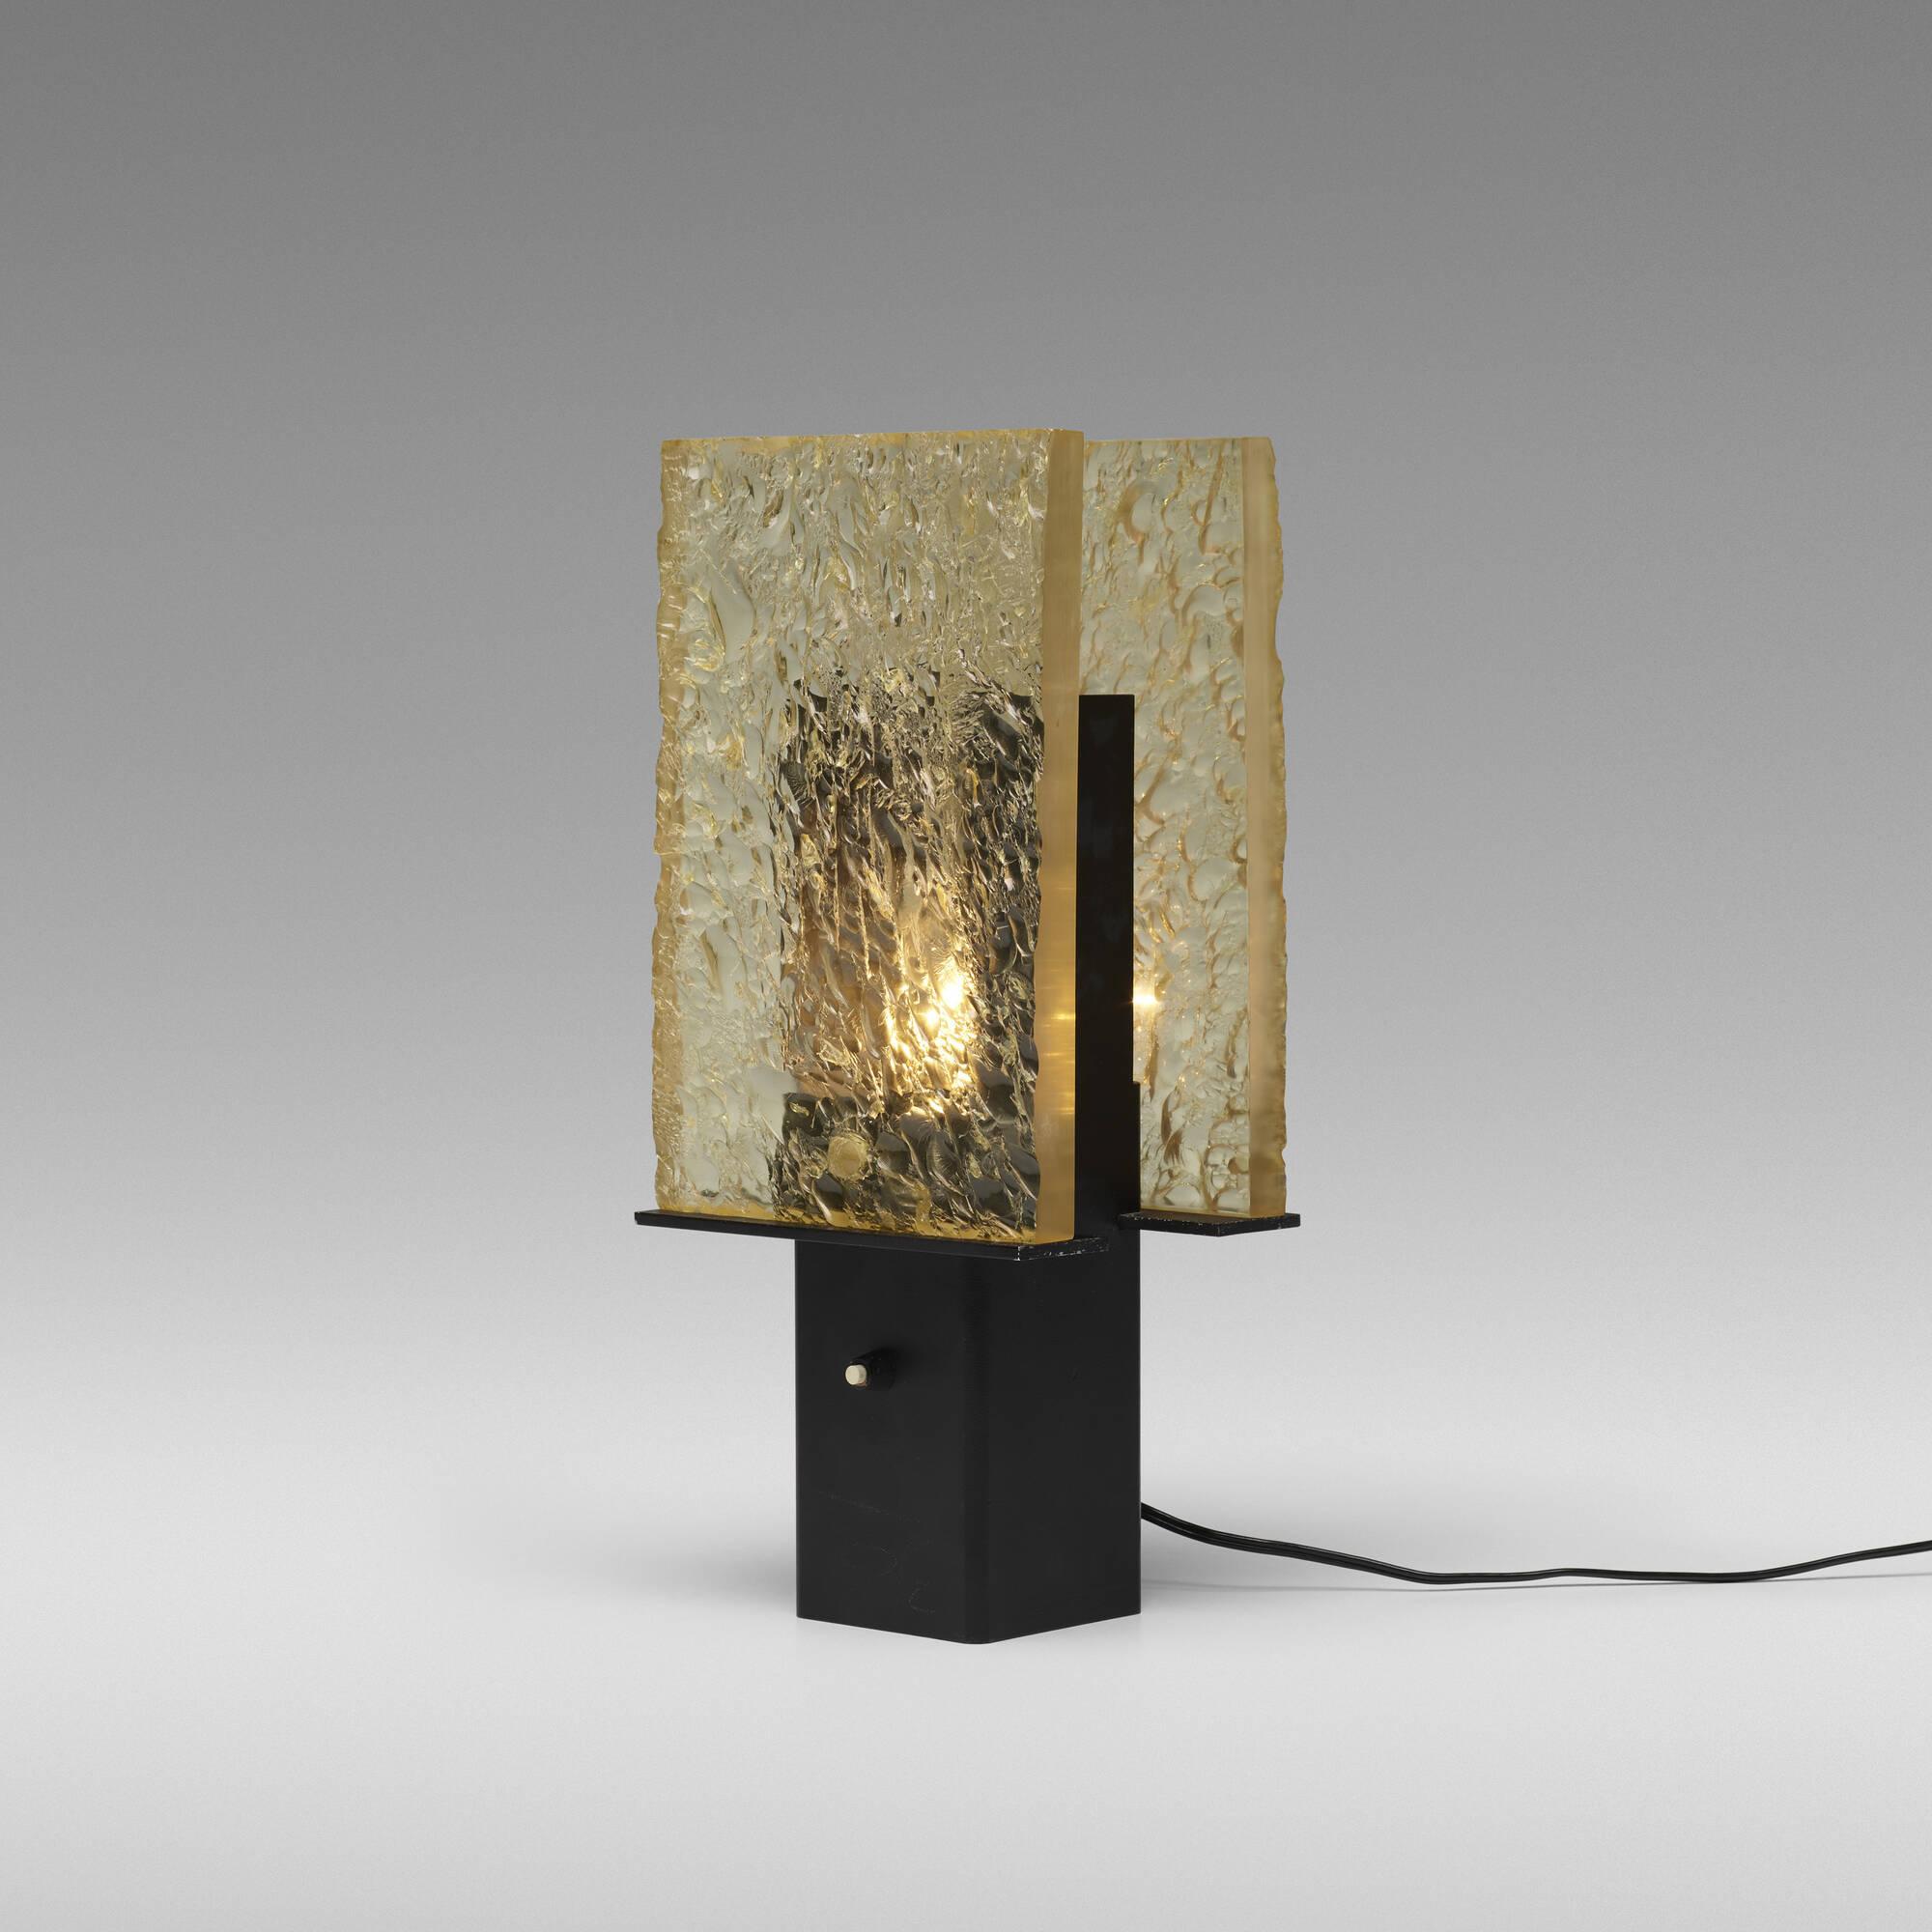 176 serge mouille dallux table lamp design 26 october 2017 176 serge mouille dallux table lamp 1 of 3 arubaitofo Images